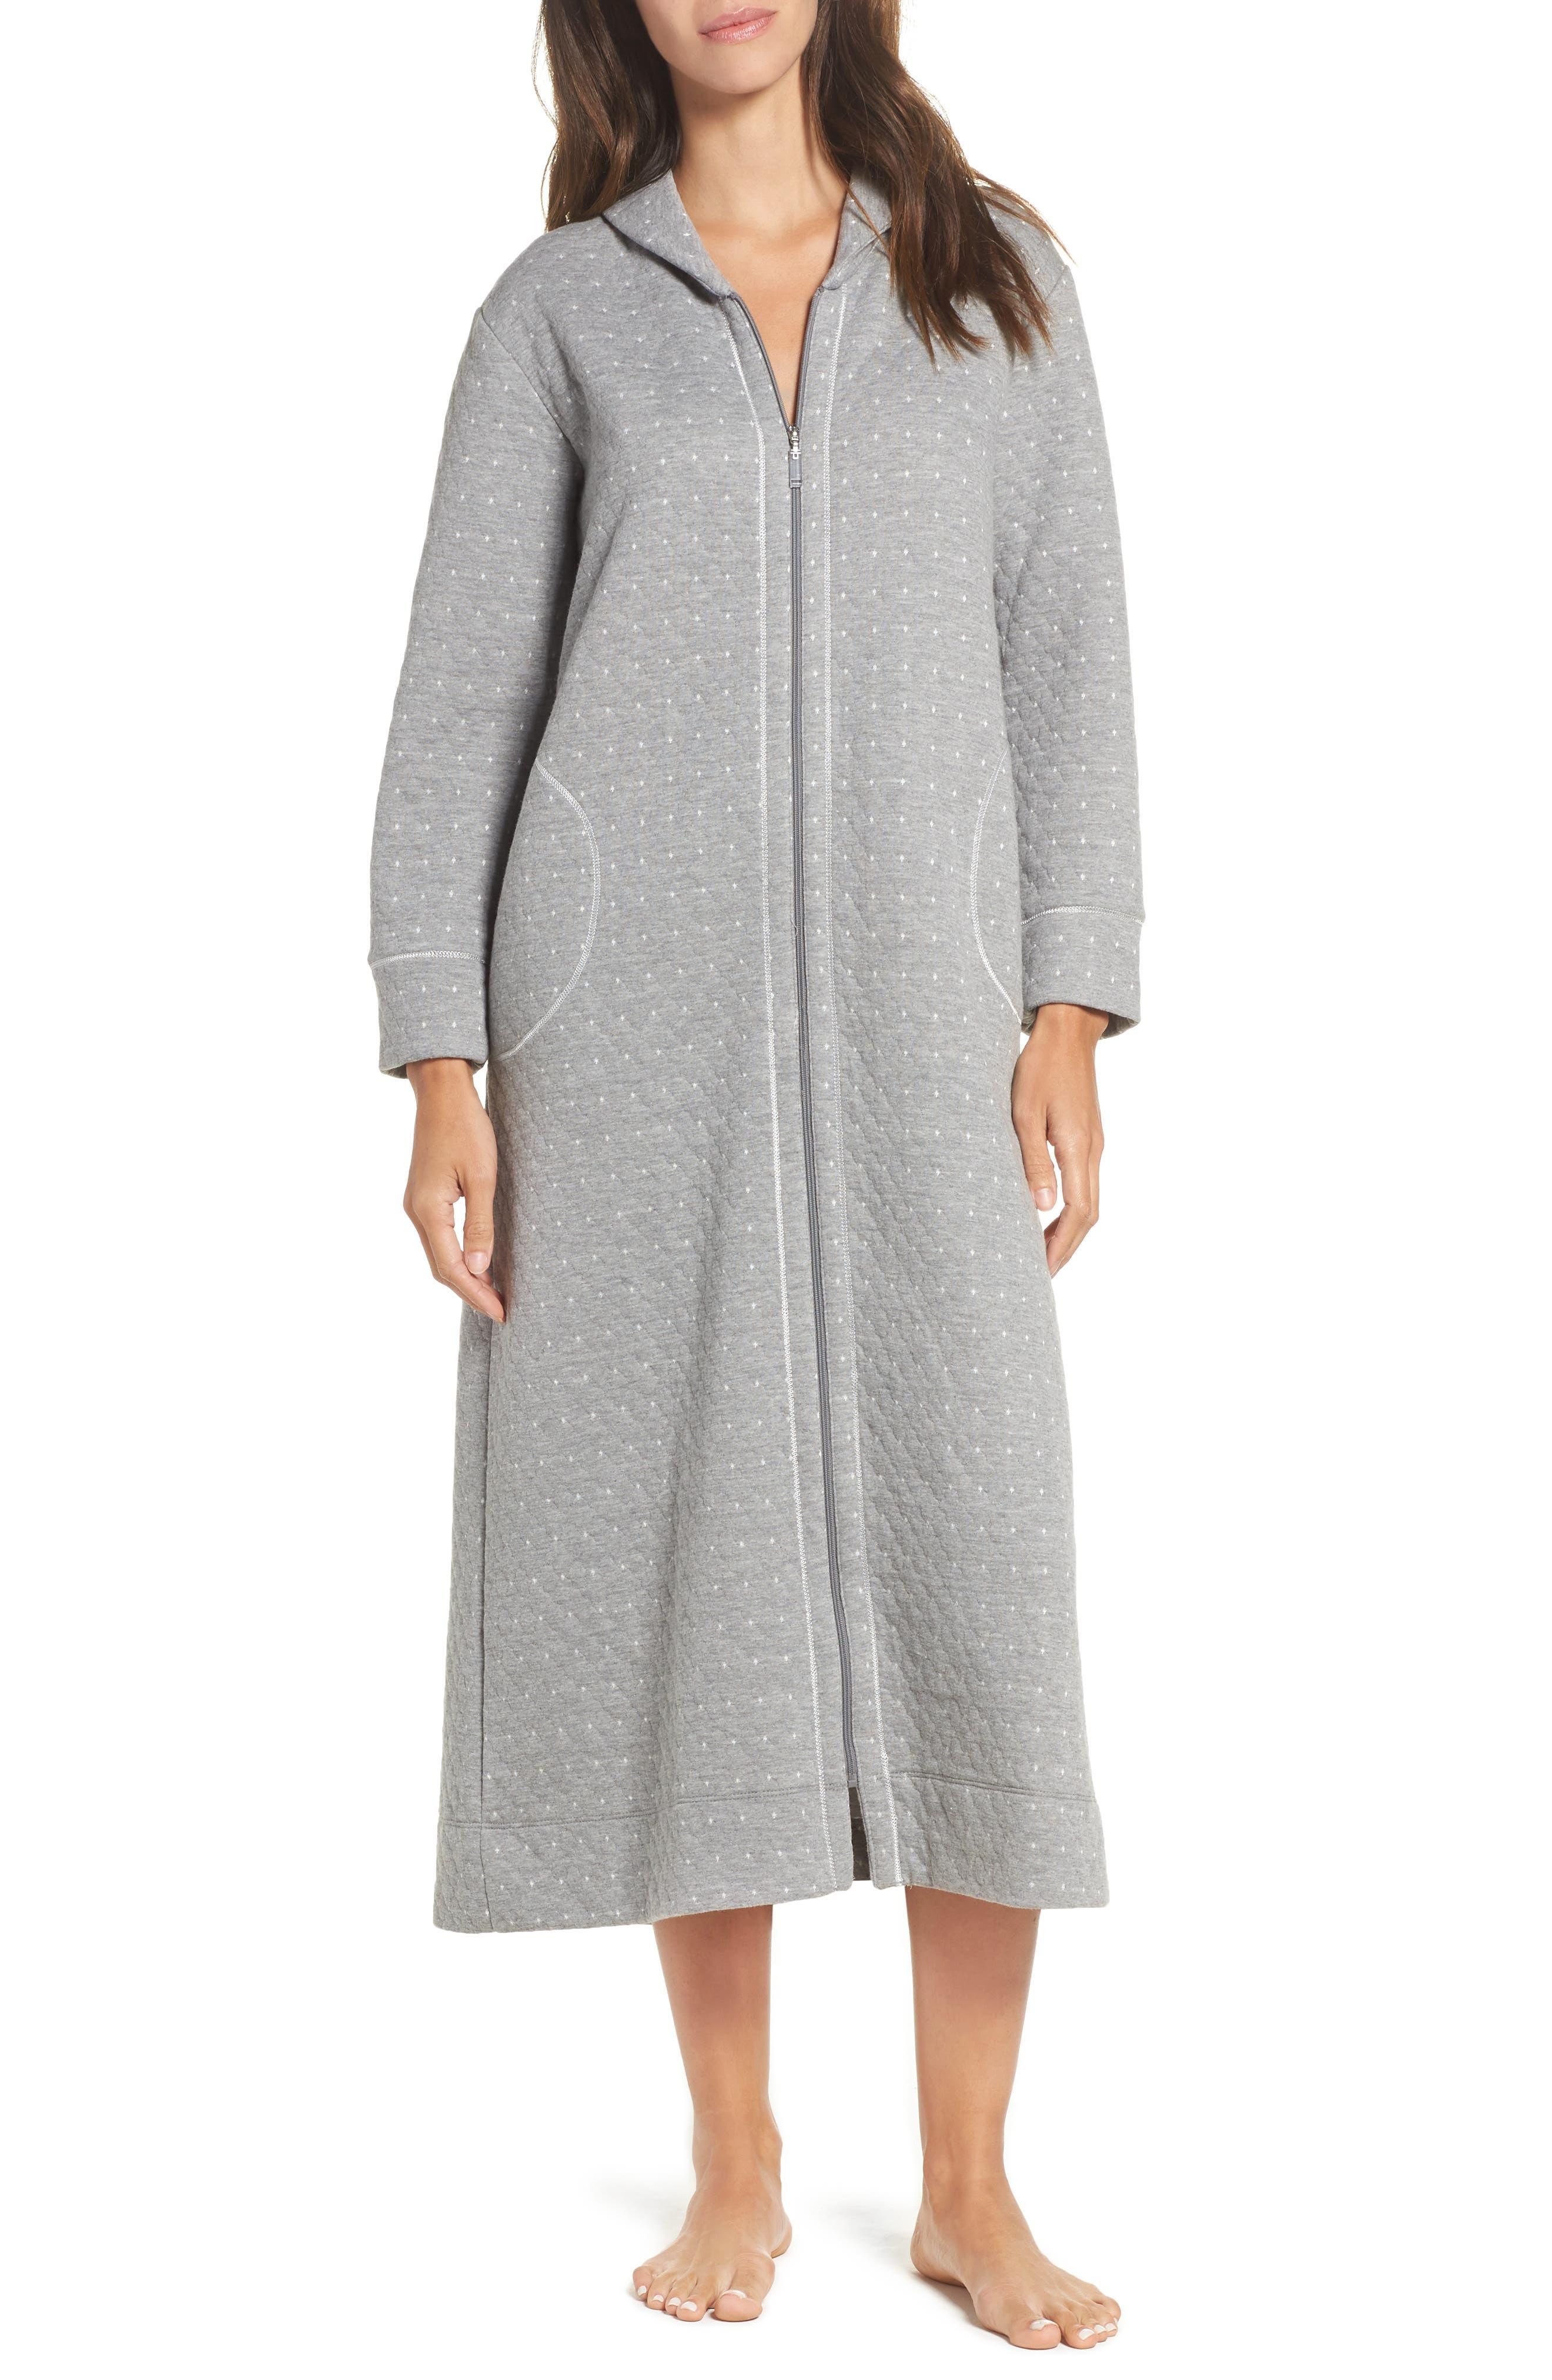 Alternate Image 1 Selected - Carole Hochman Long Zip Robe